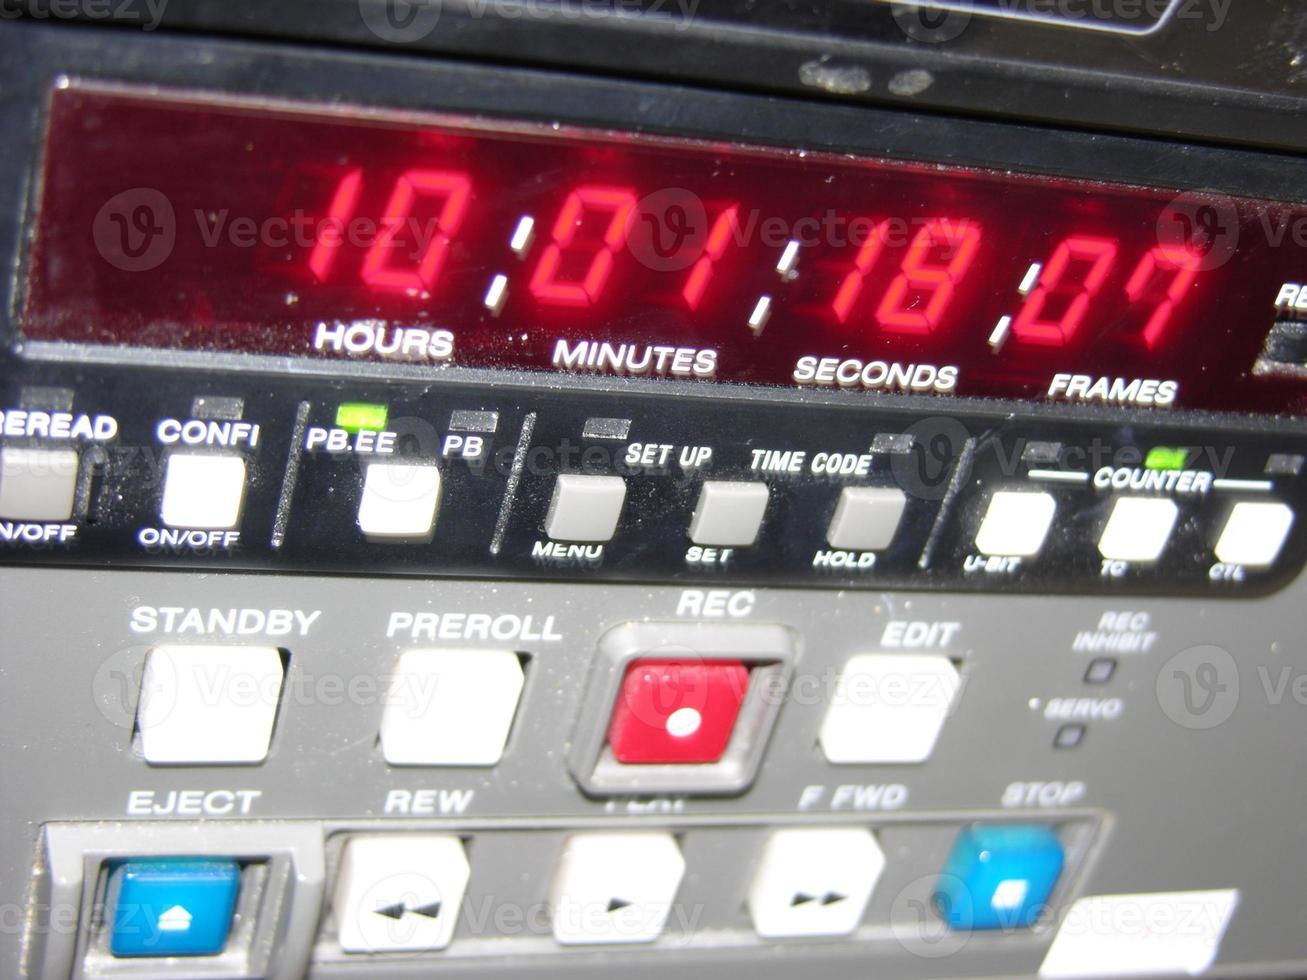 VCR foto